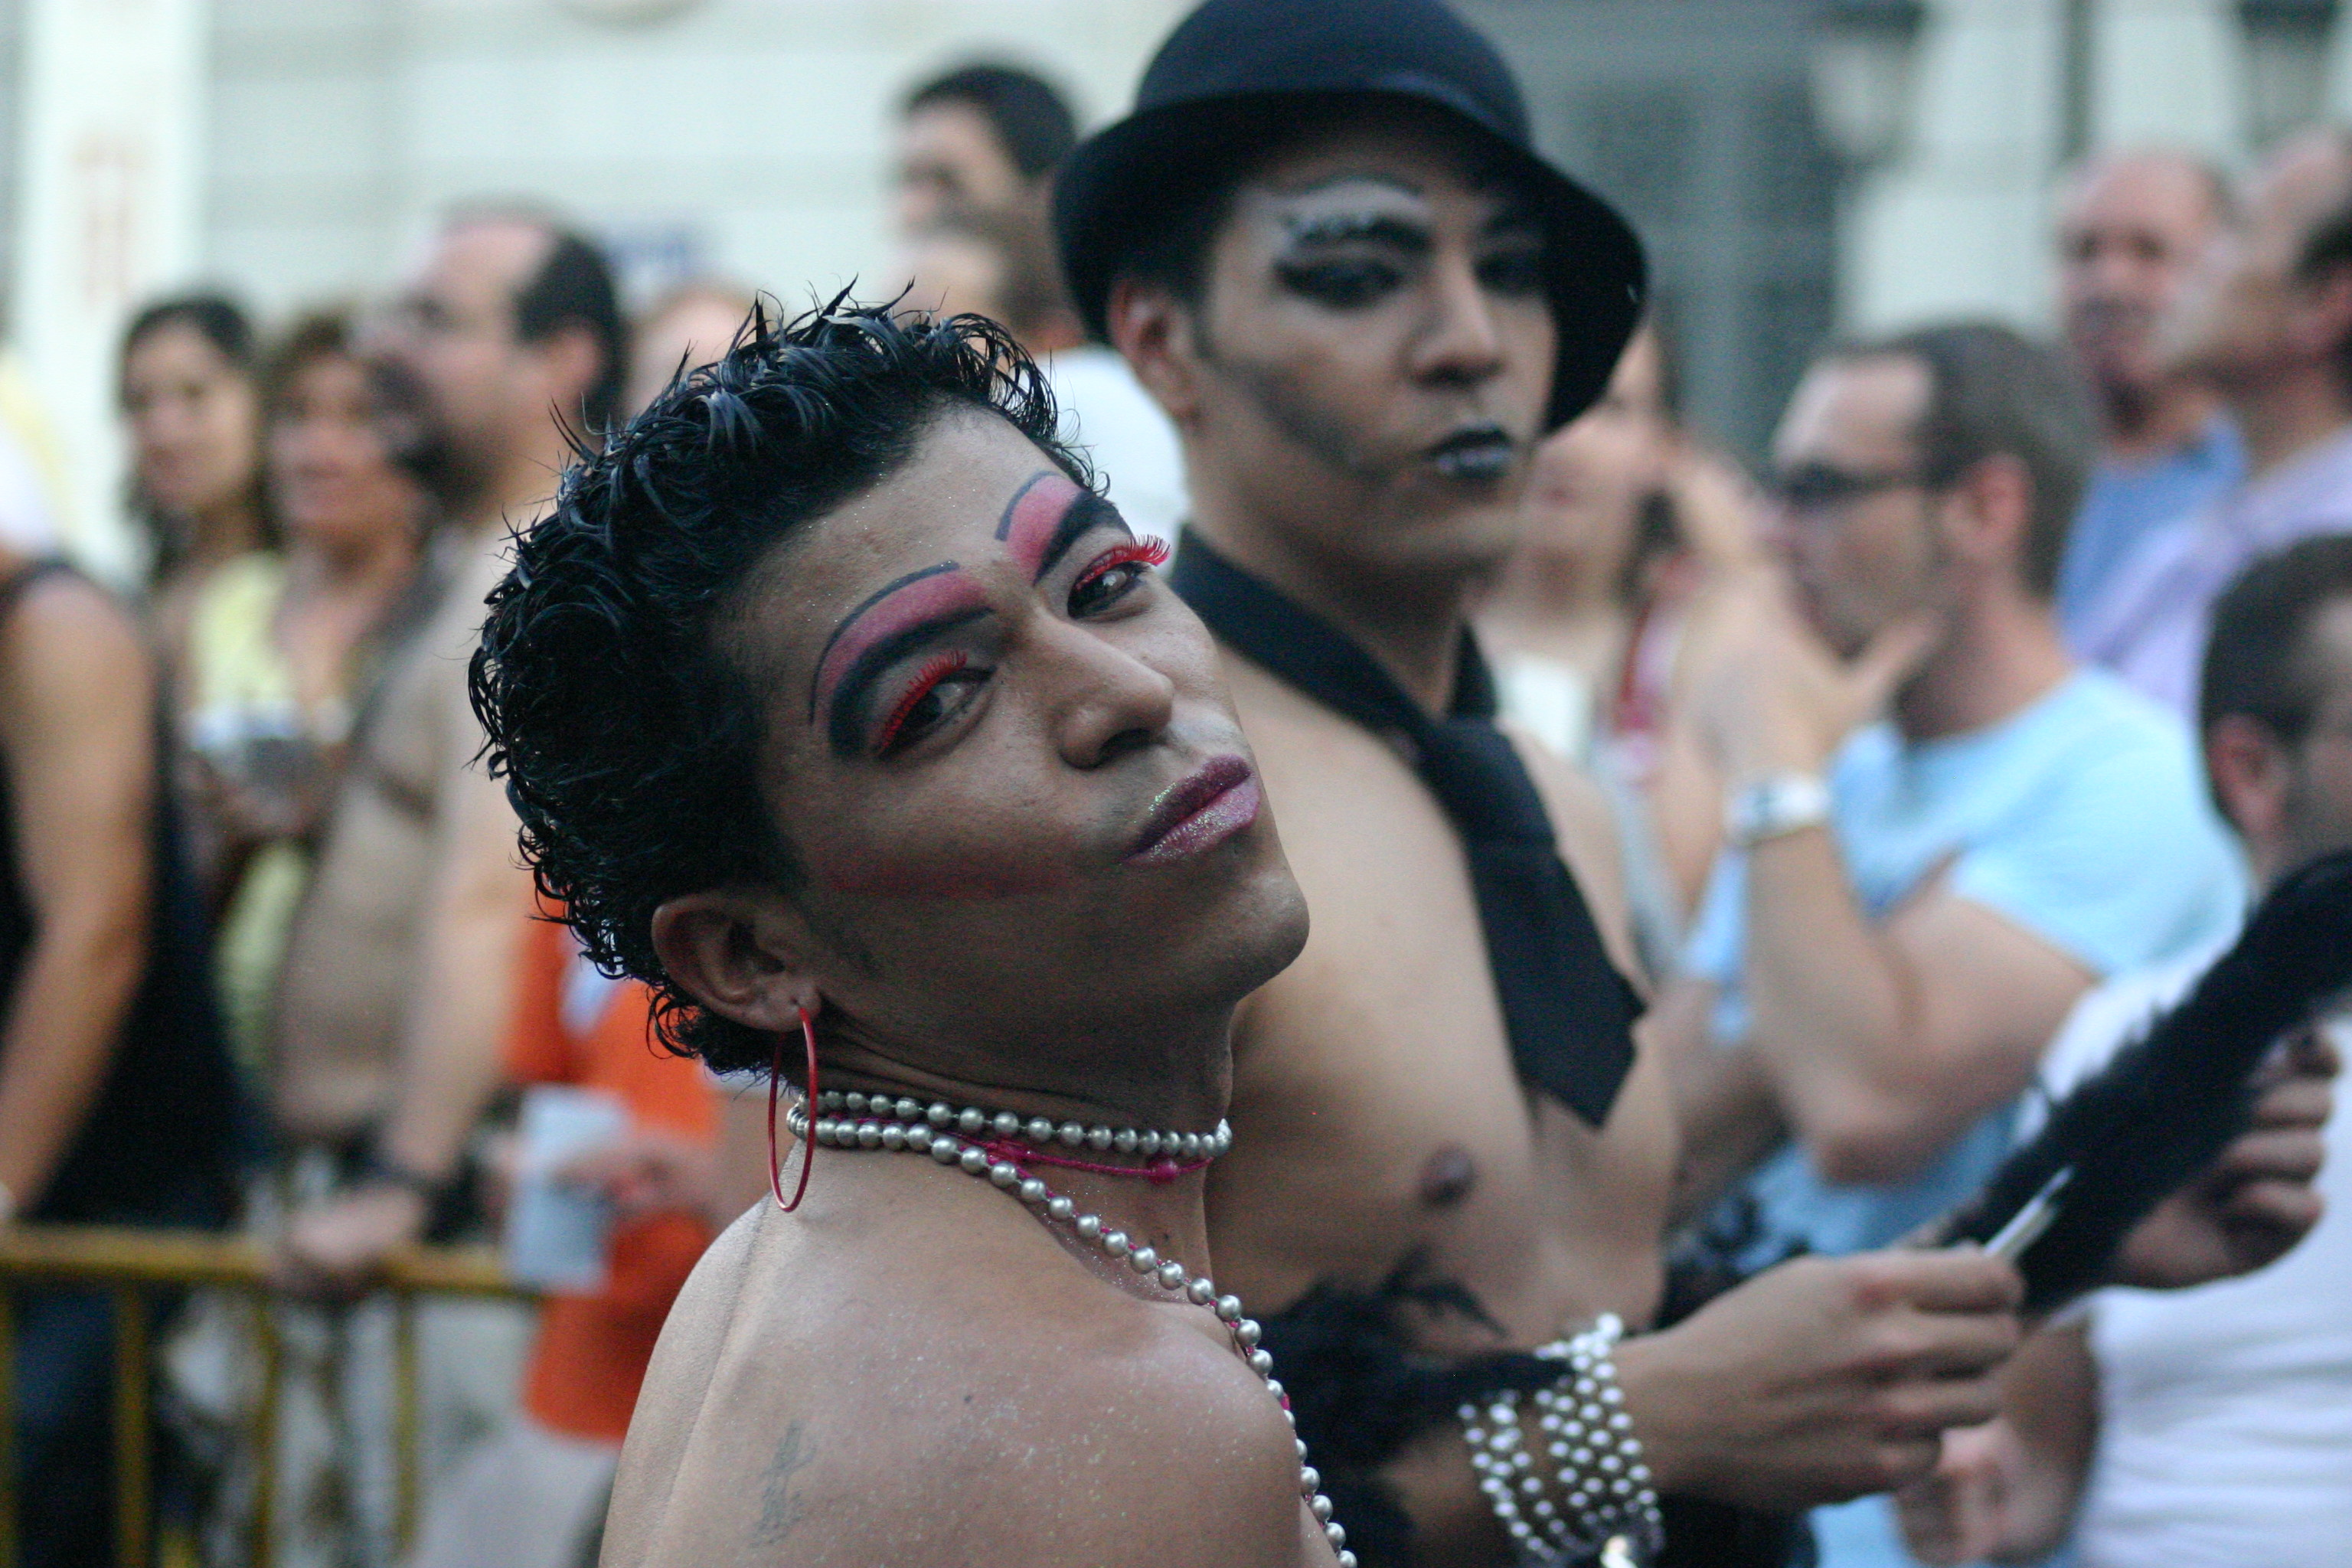 Orgullo Gay 73